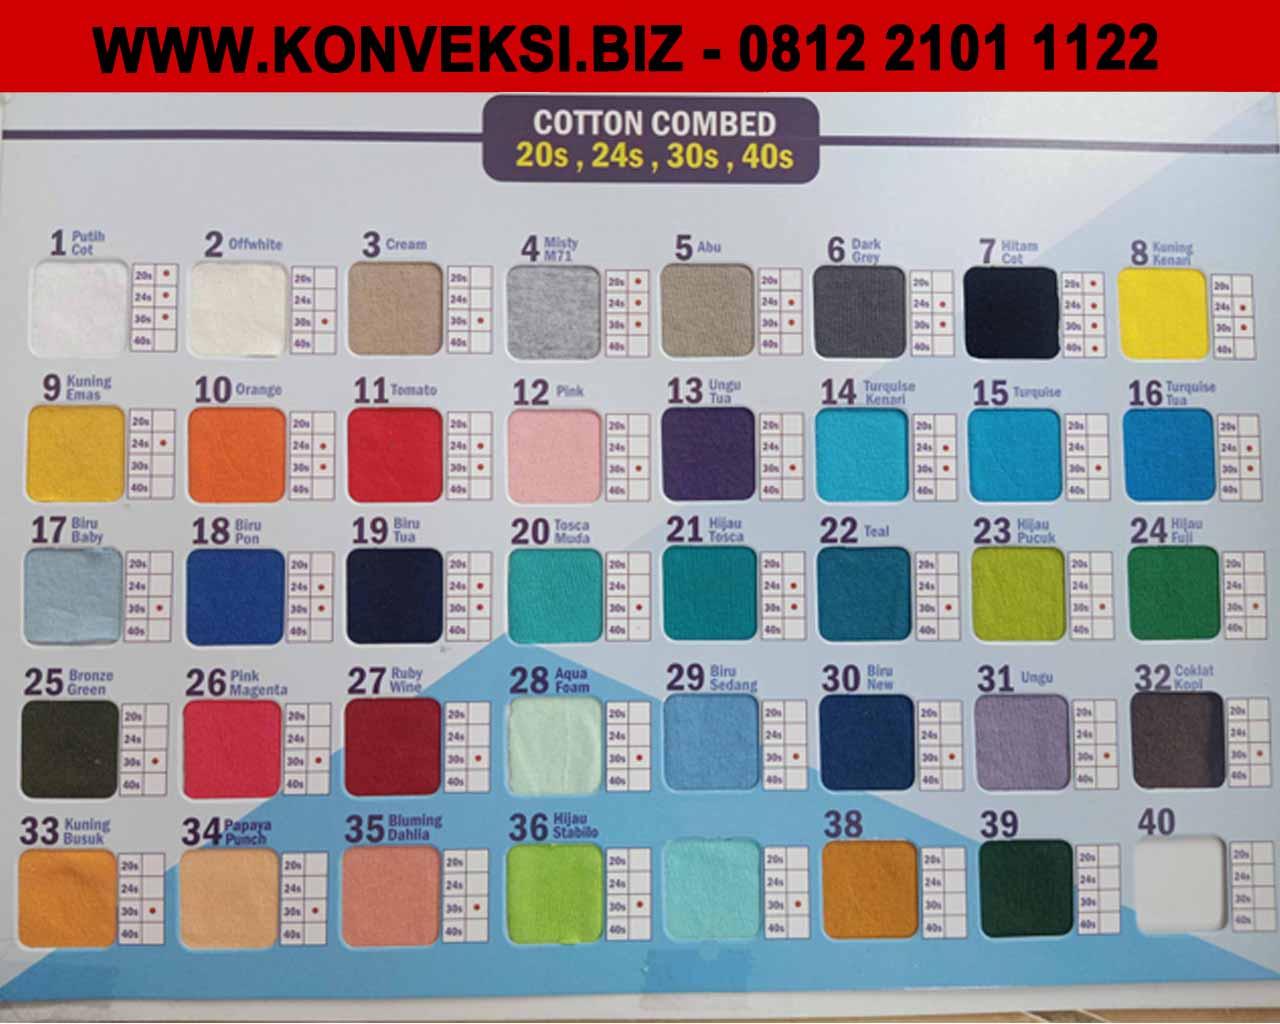 Katalog Warna Cotton Combed Terbaru